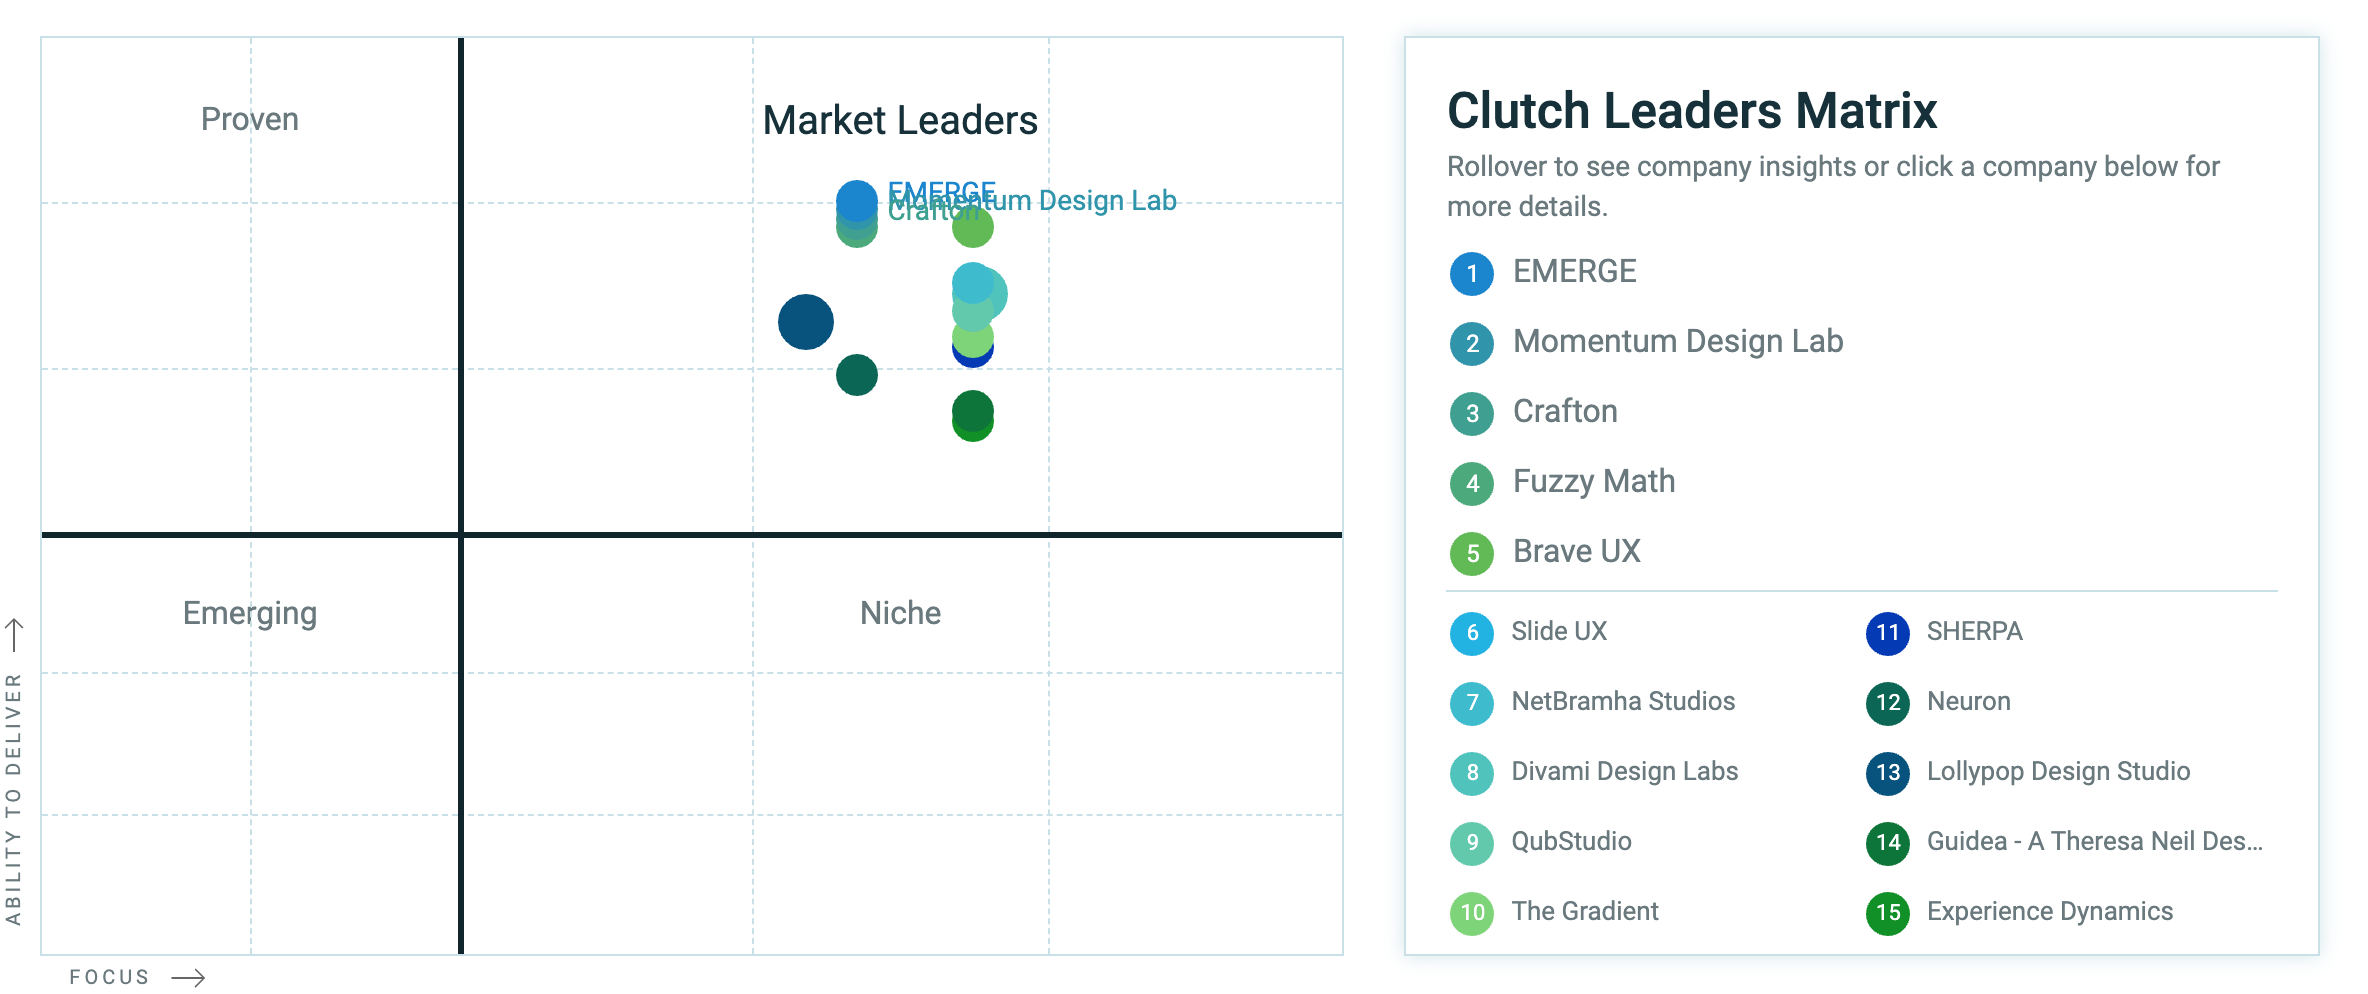 Clutch Leaders Matrix - UX Design